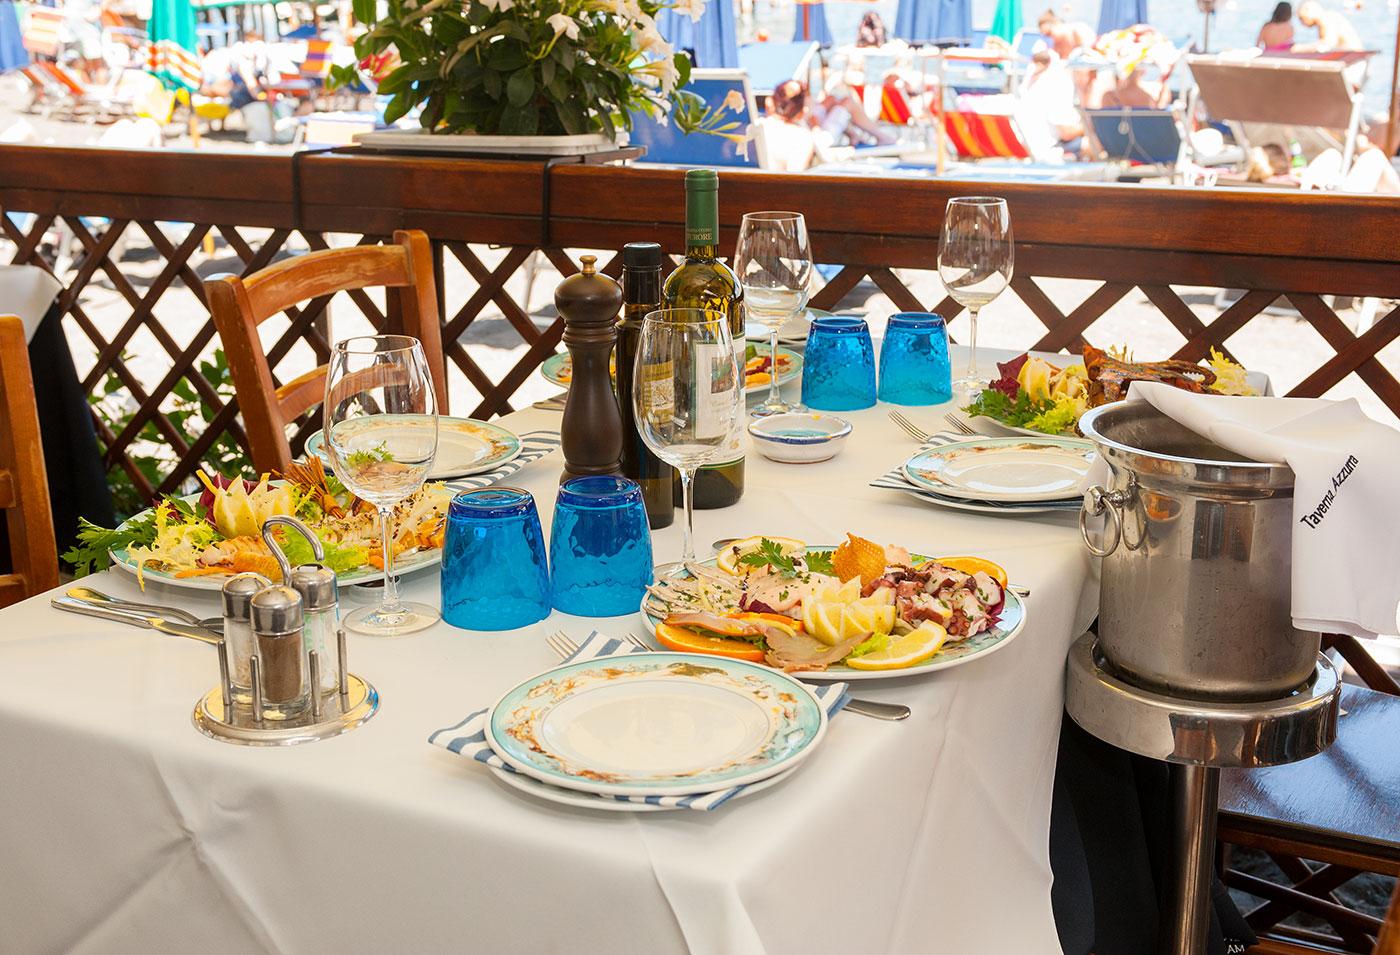 Ristorante Taverna Azzurra